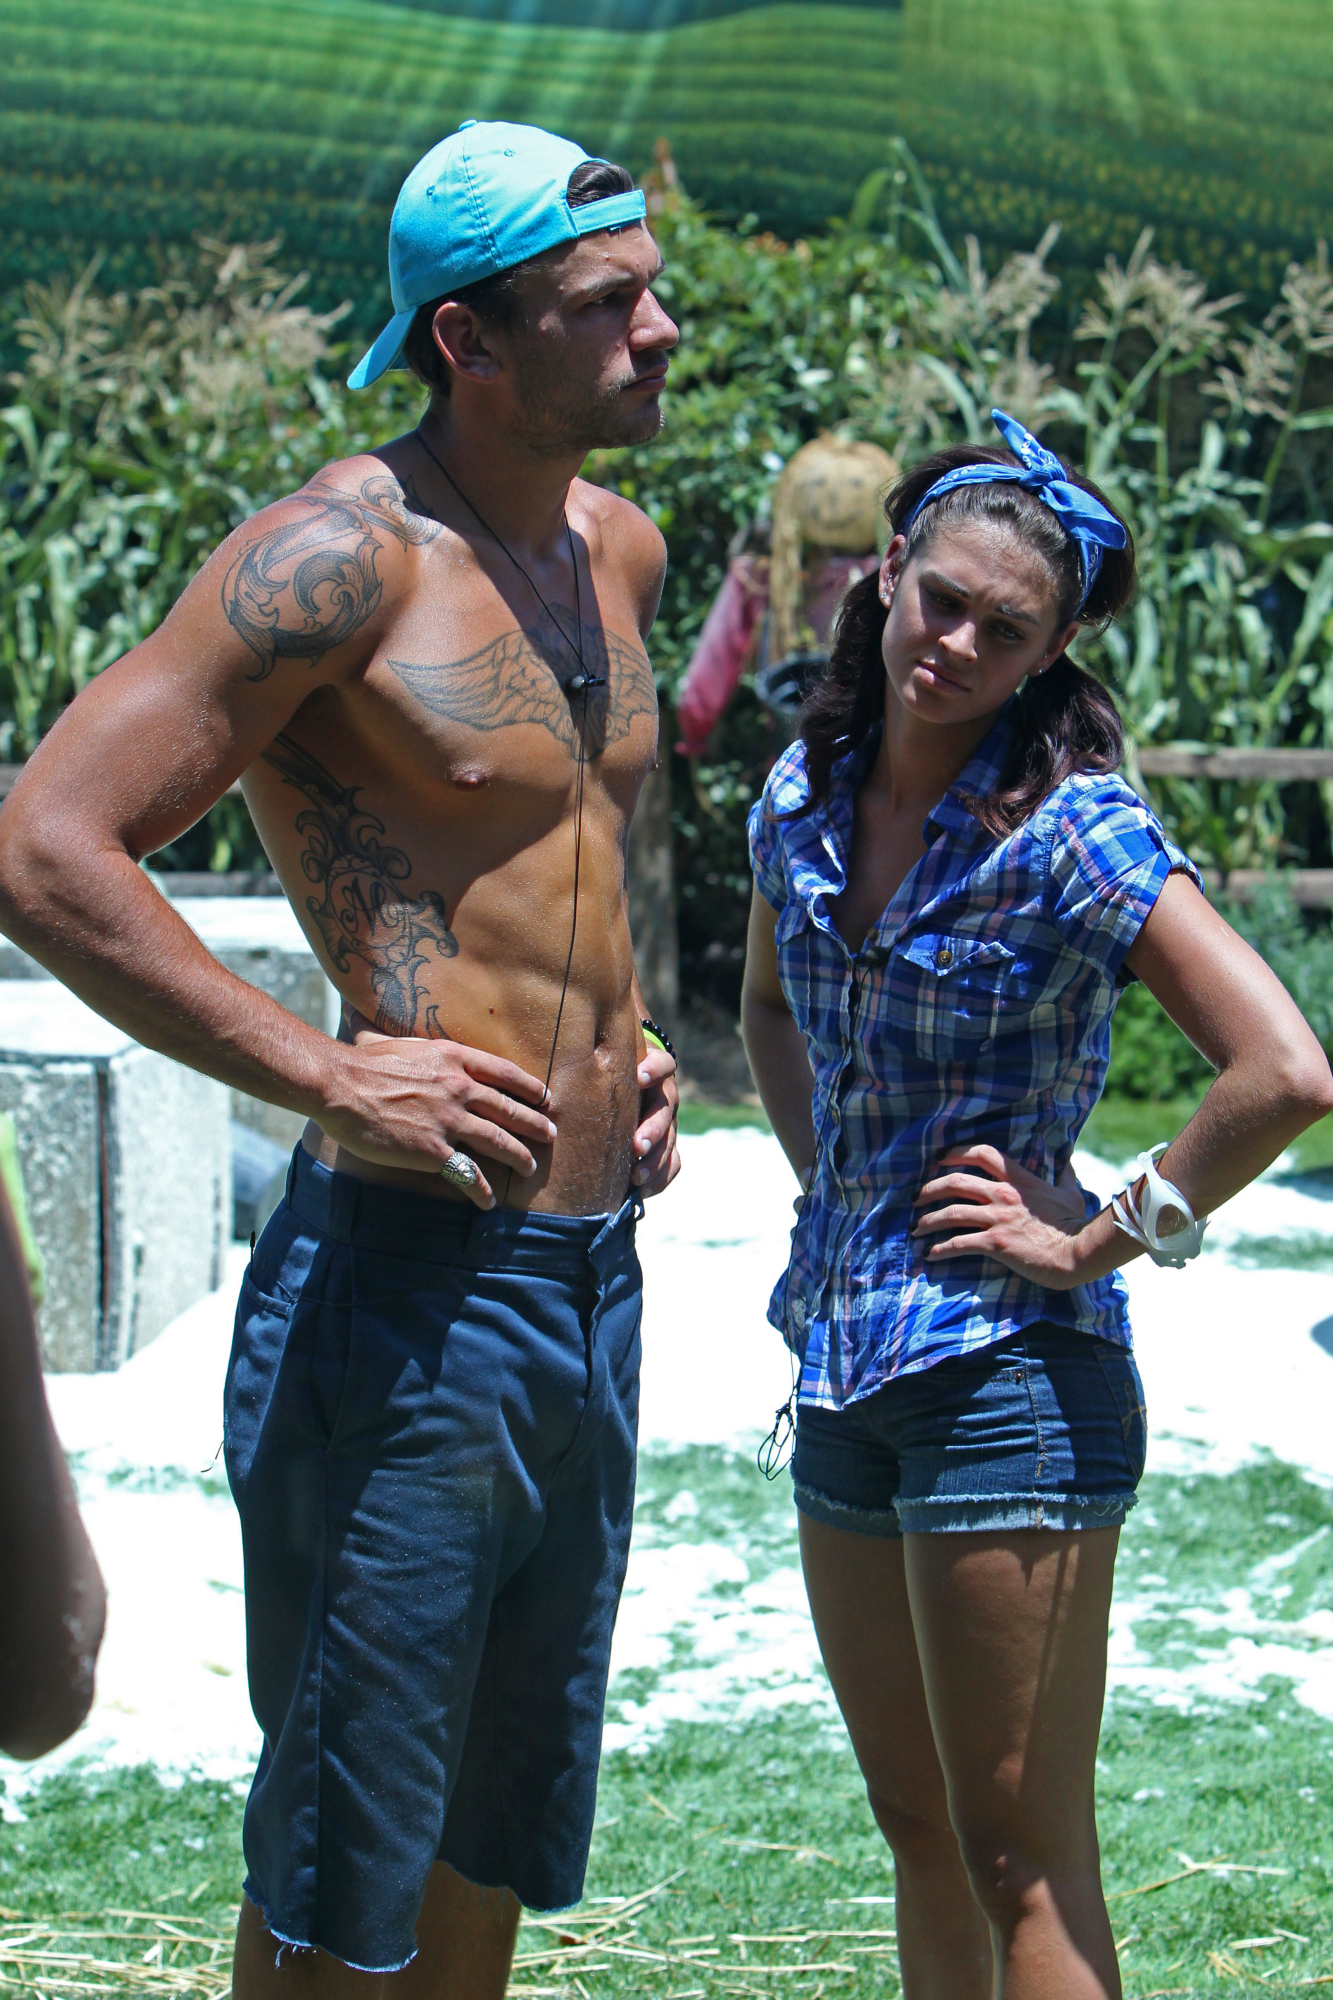 Jeremy & Kaitlin